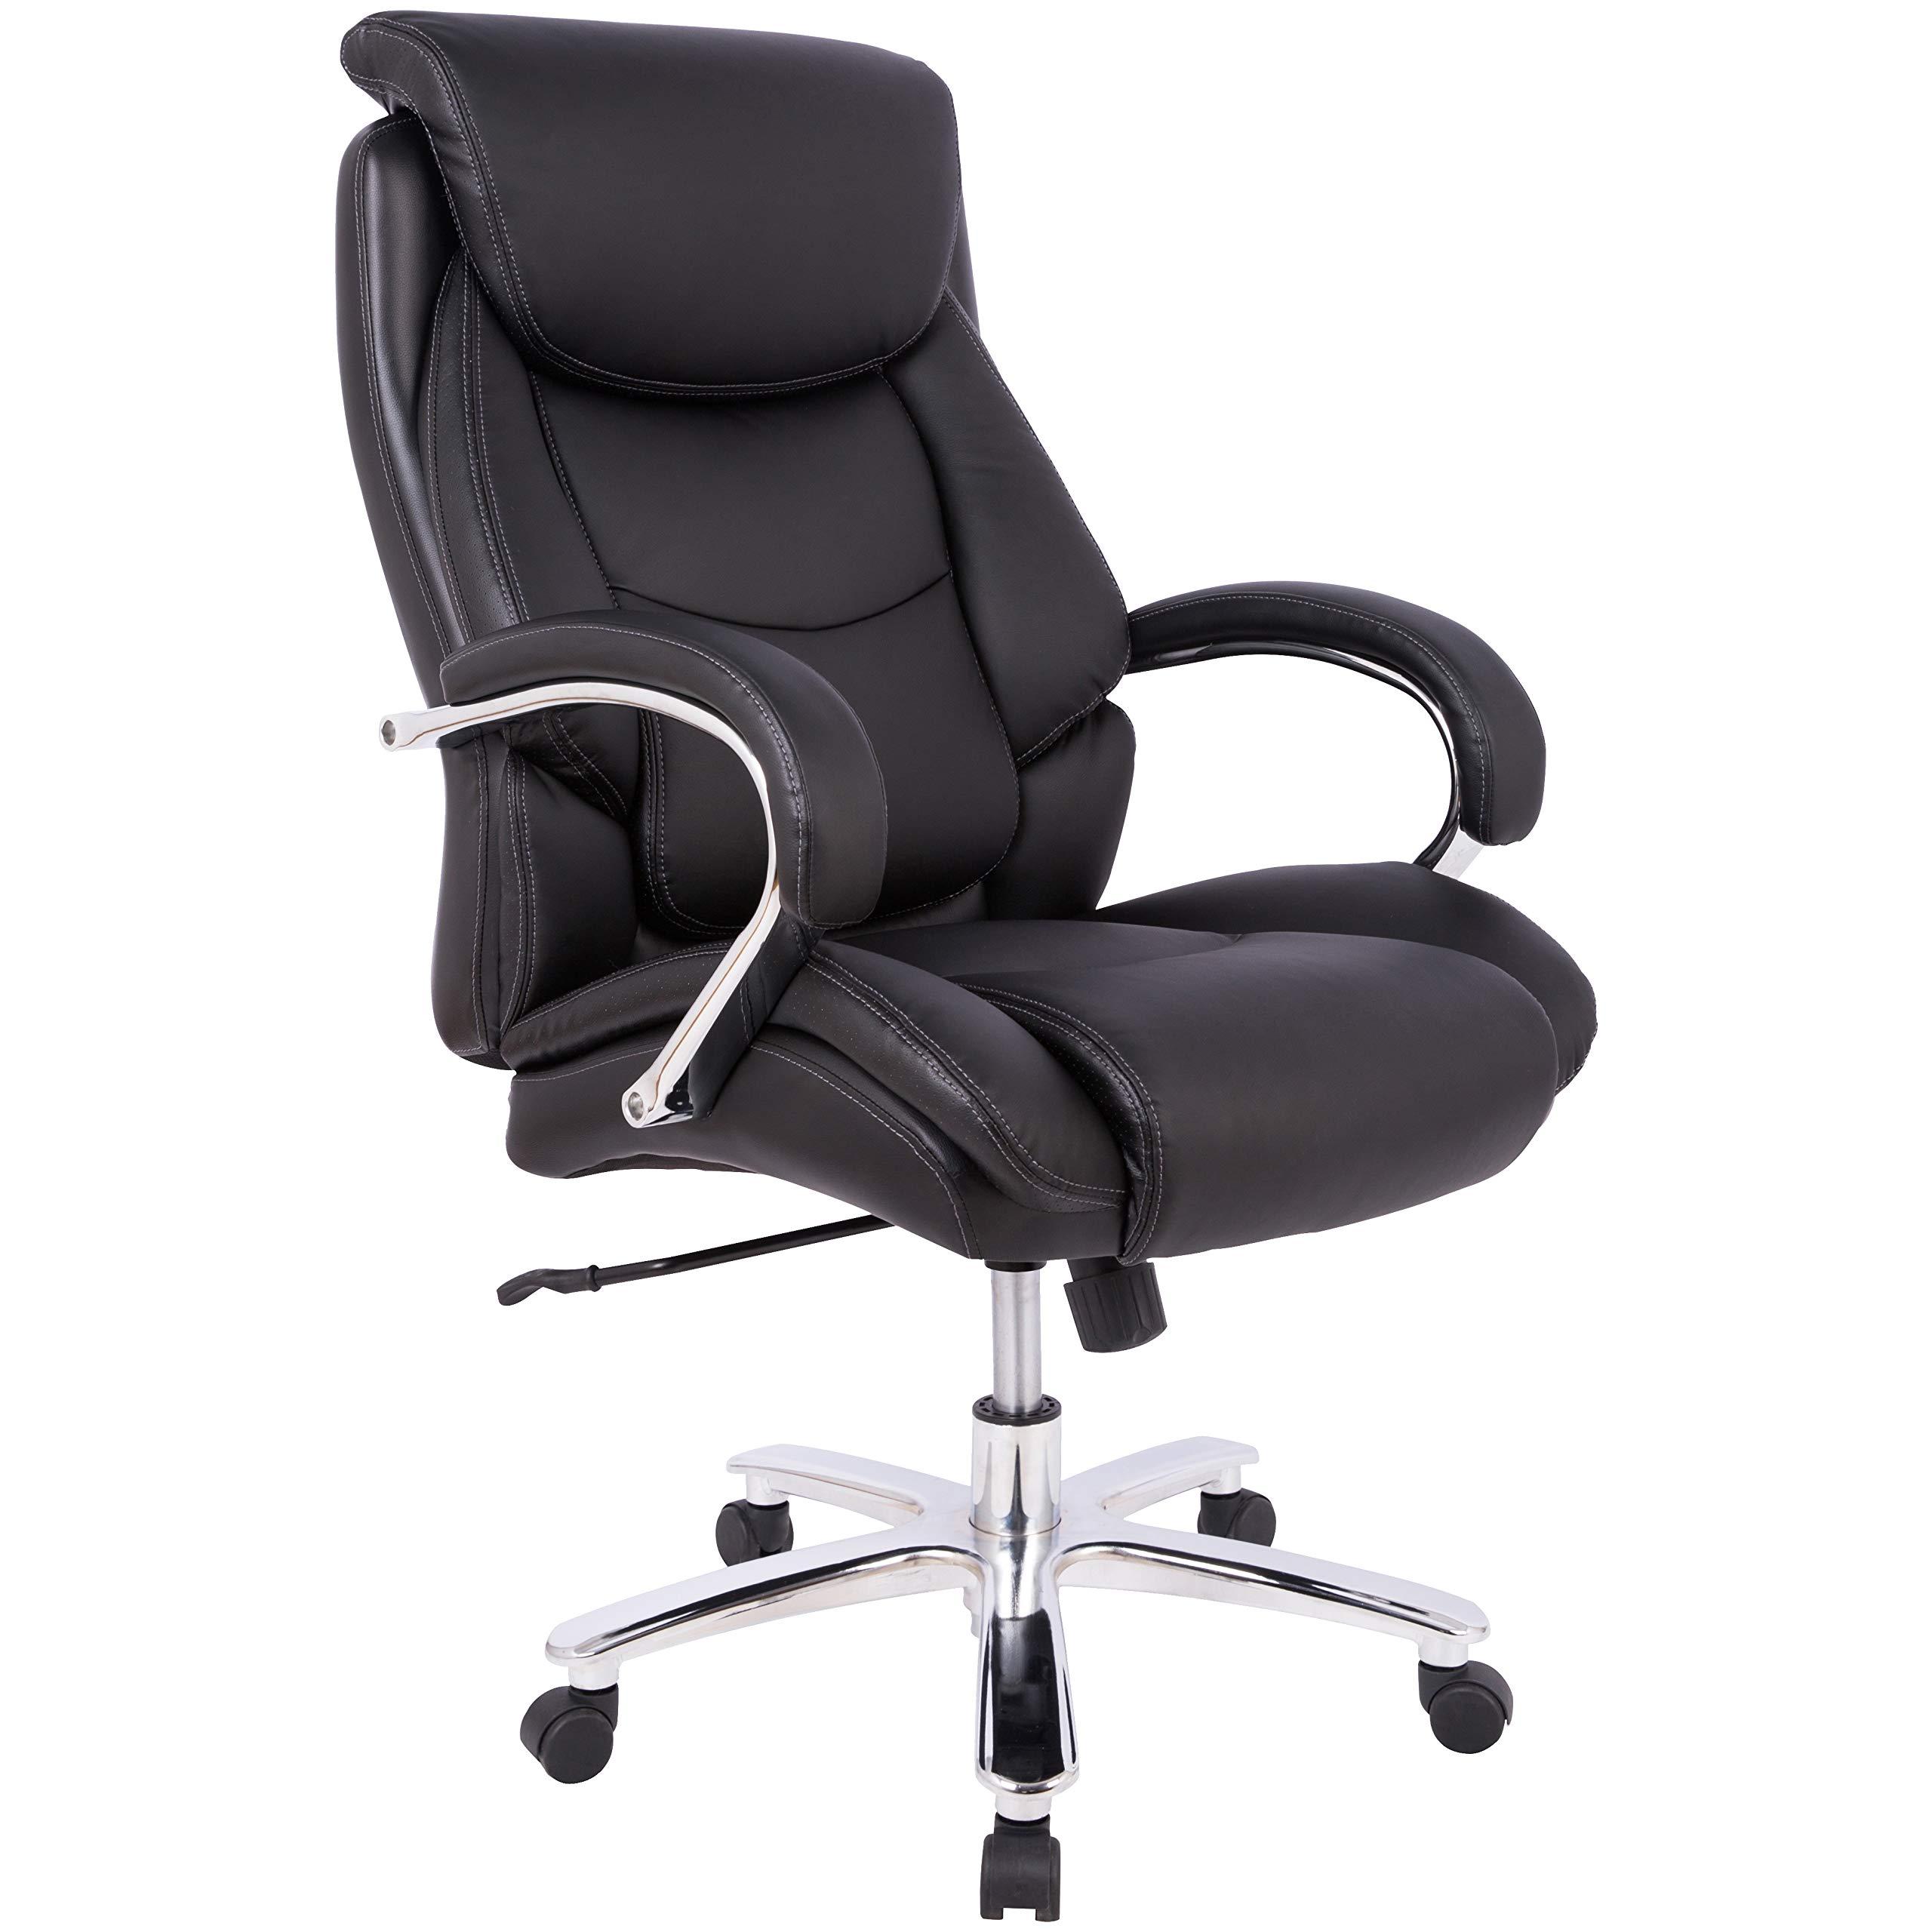 AmazonBasics Big & Tall Executive Office Desk Chair - Adjustable with Armrest, 500-Pound Capacity - Black with Pewter Finish by AmazonBasics